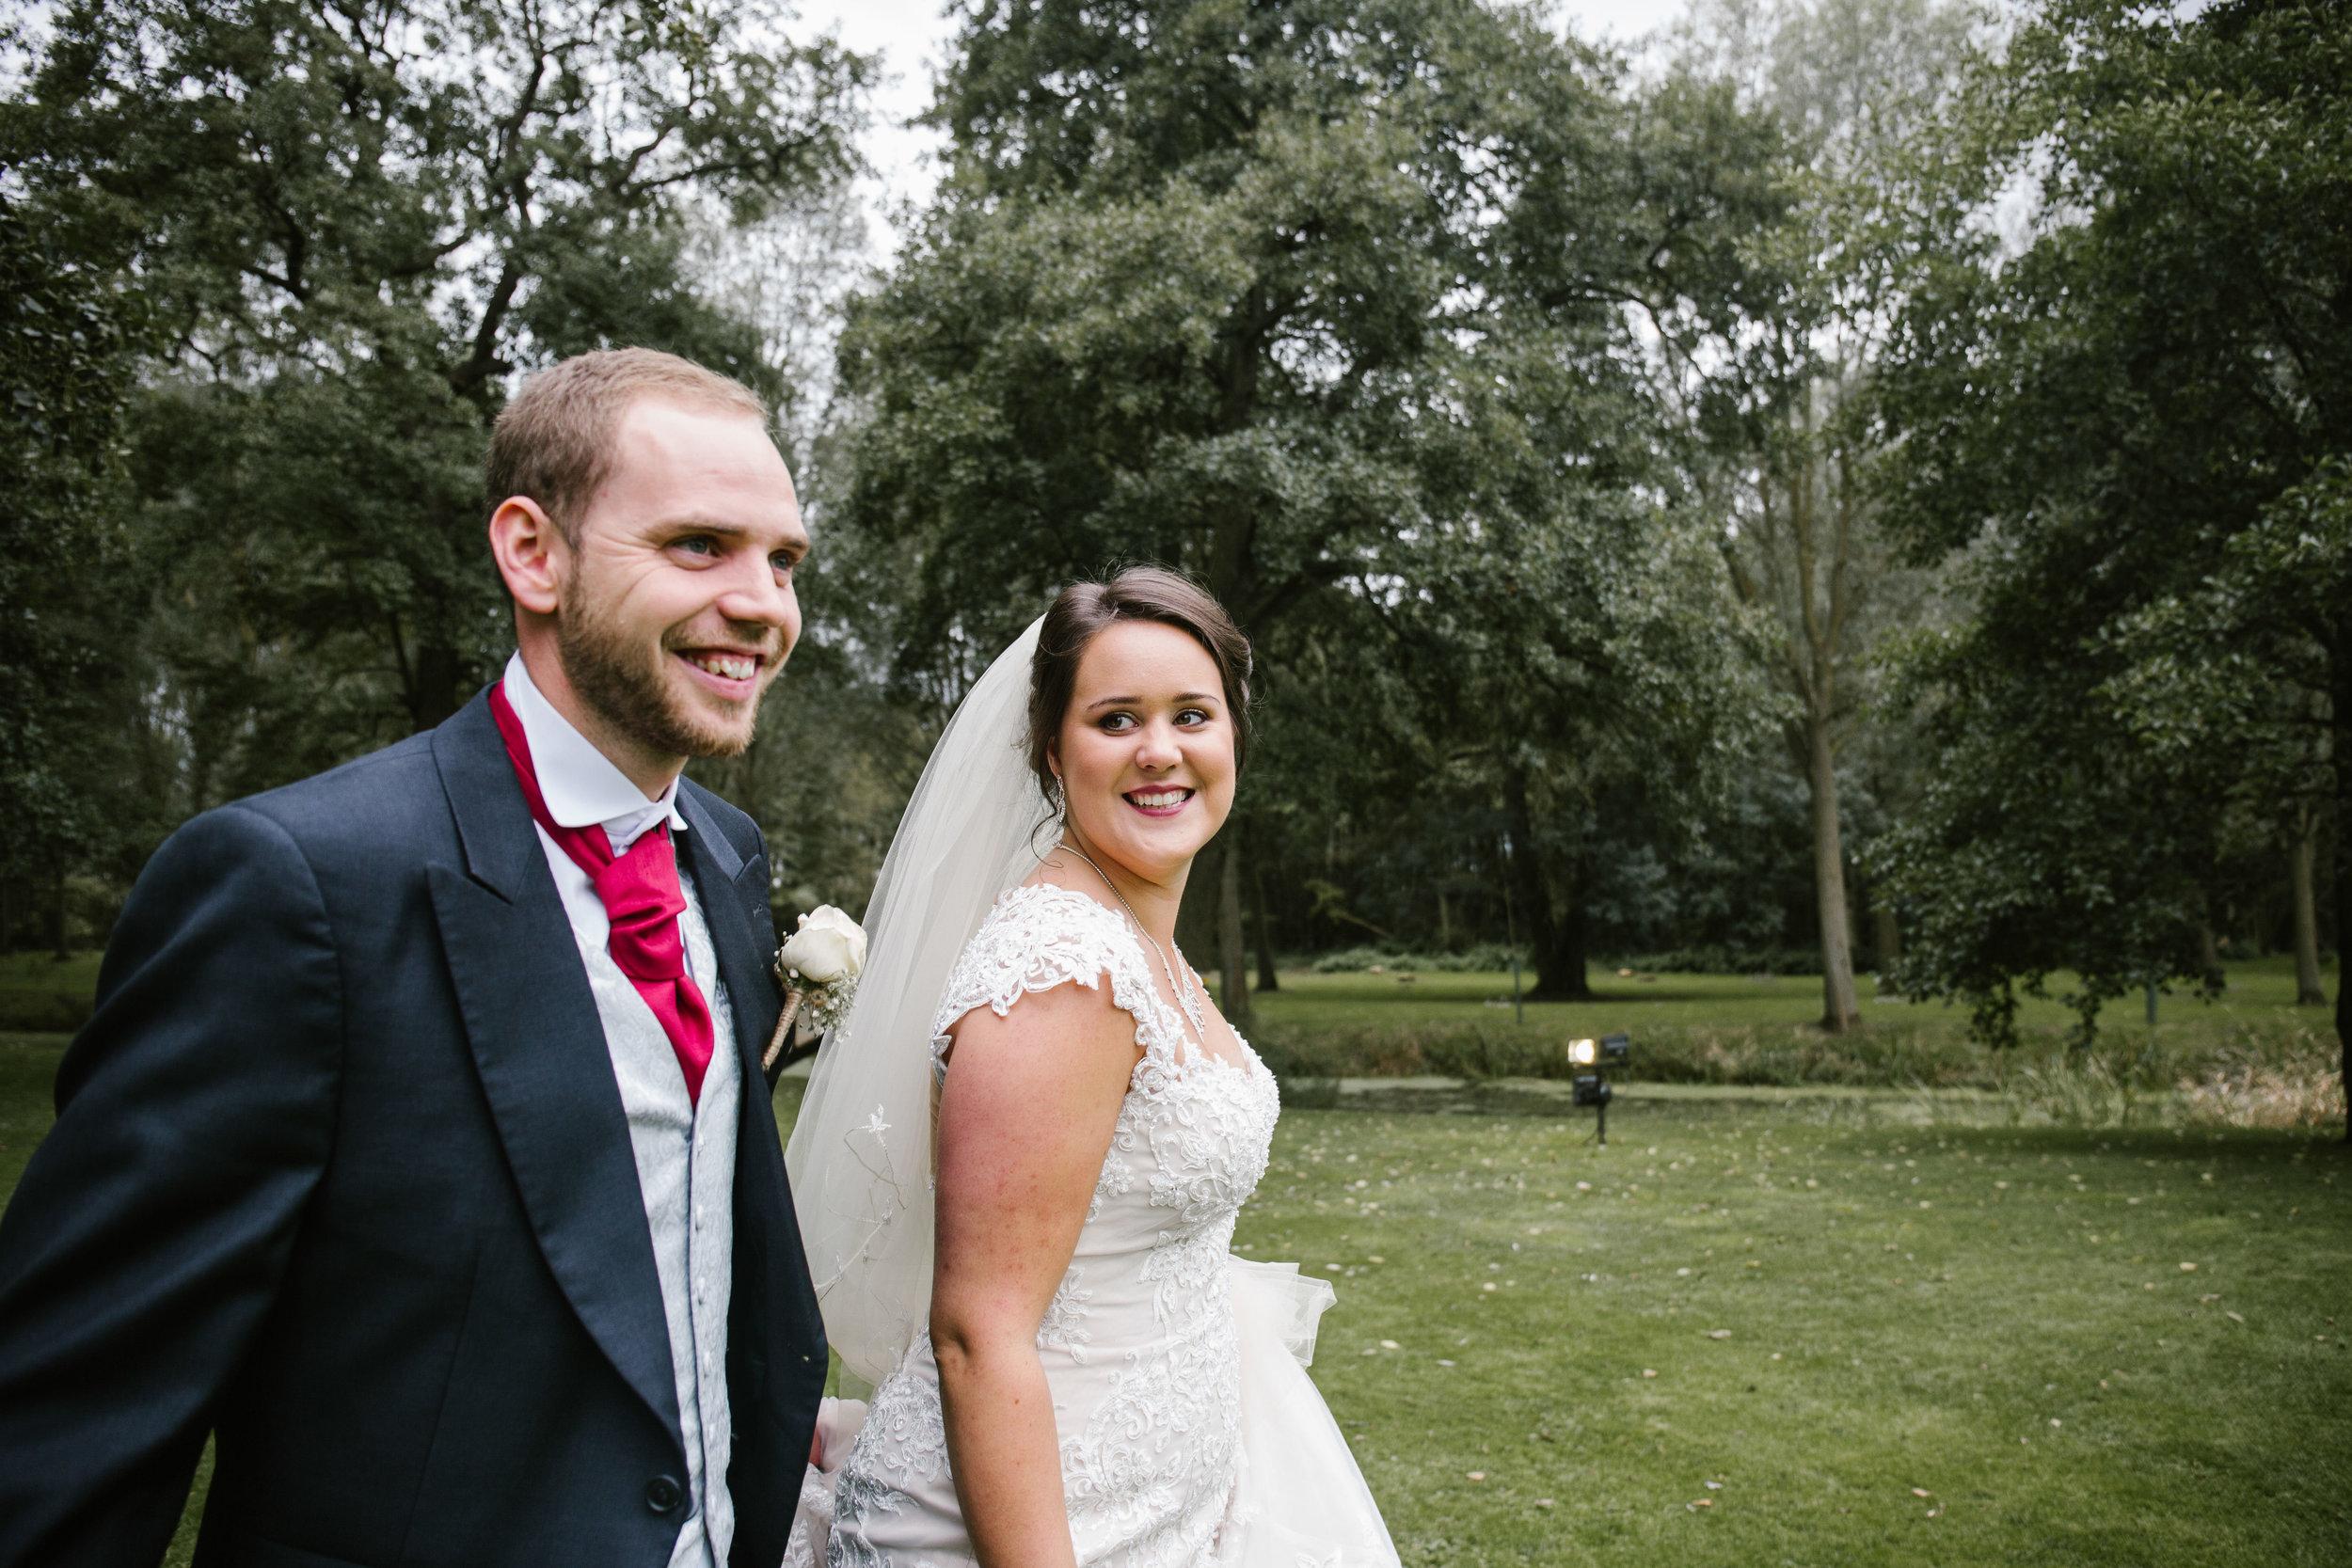 Staffordshire wedding photographer, wedding ideas, wedding inspiration, barn wedding, diy wedding-154.jpg